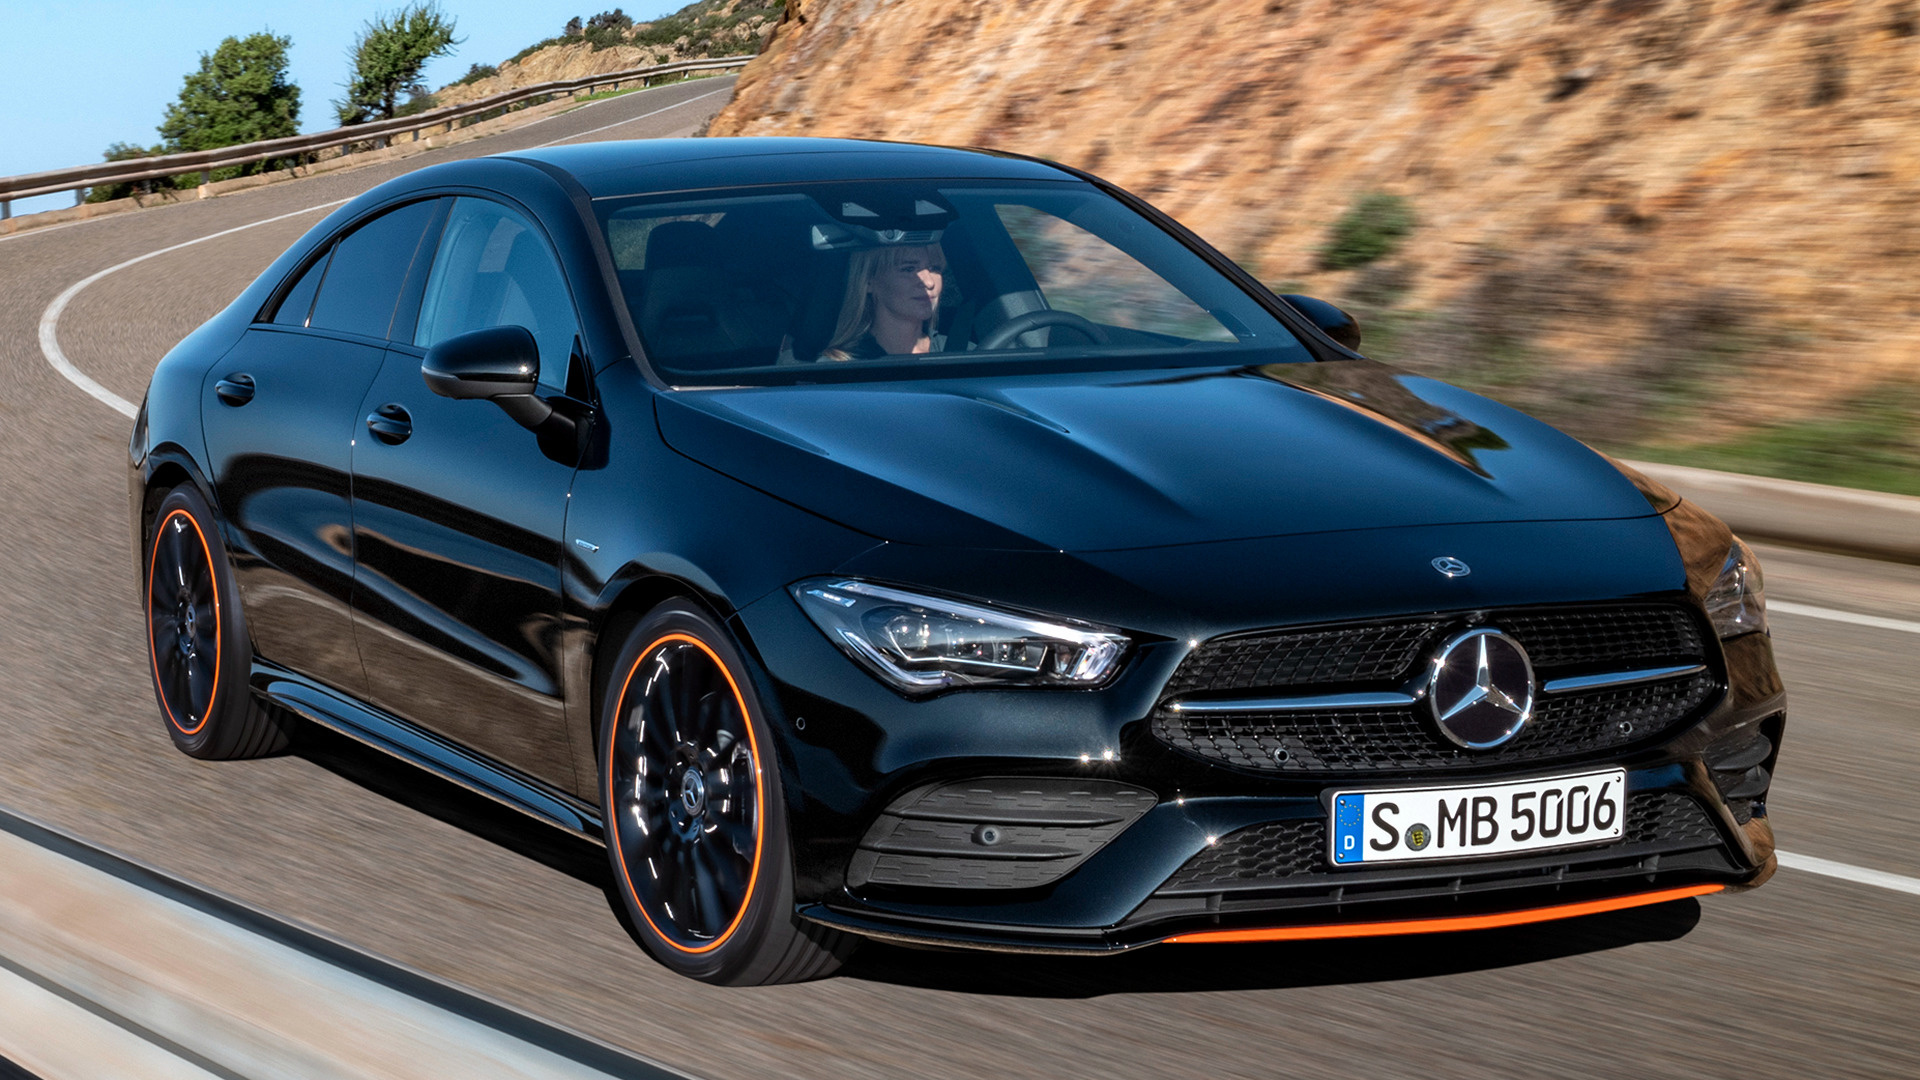 Mercedes Benz Cla >> 2019 Mercedes-Benz CLA-Class OrangeArt Edition - Wallpapers and HD Images | Car Pixel